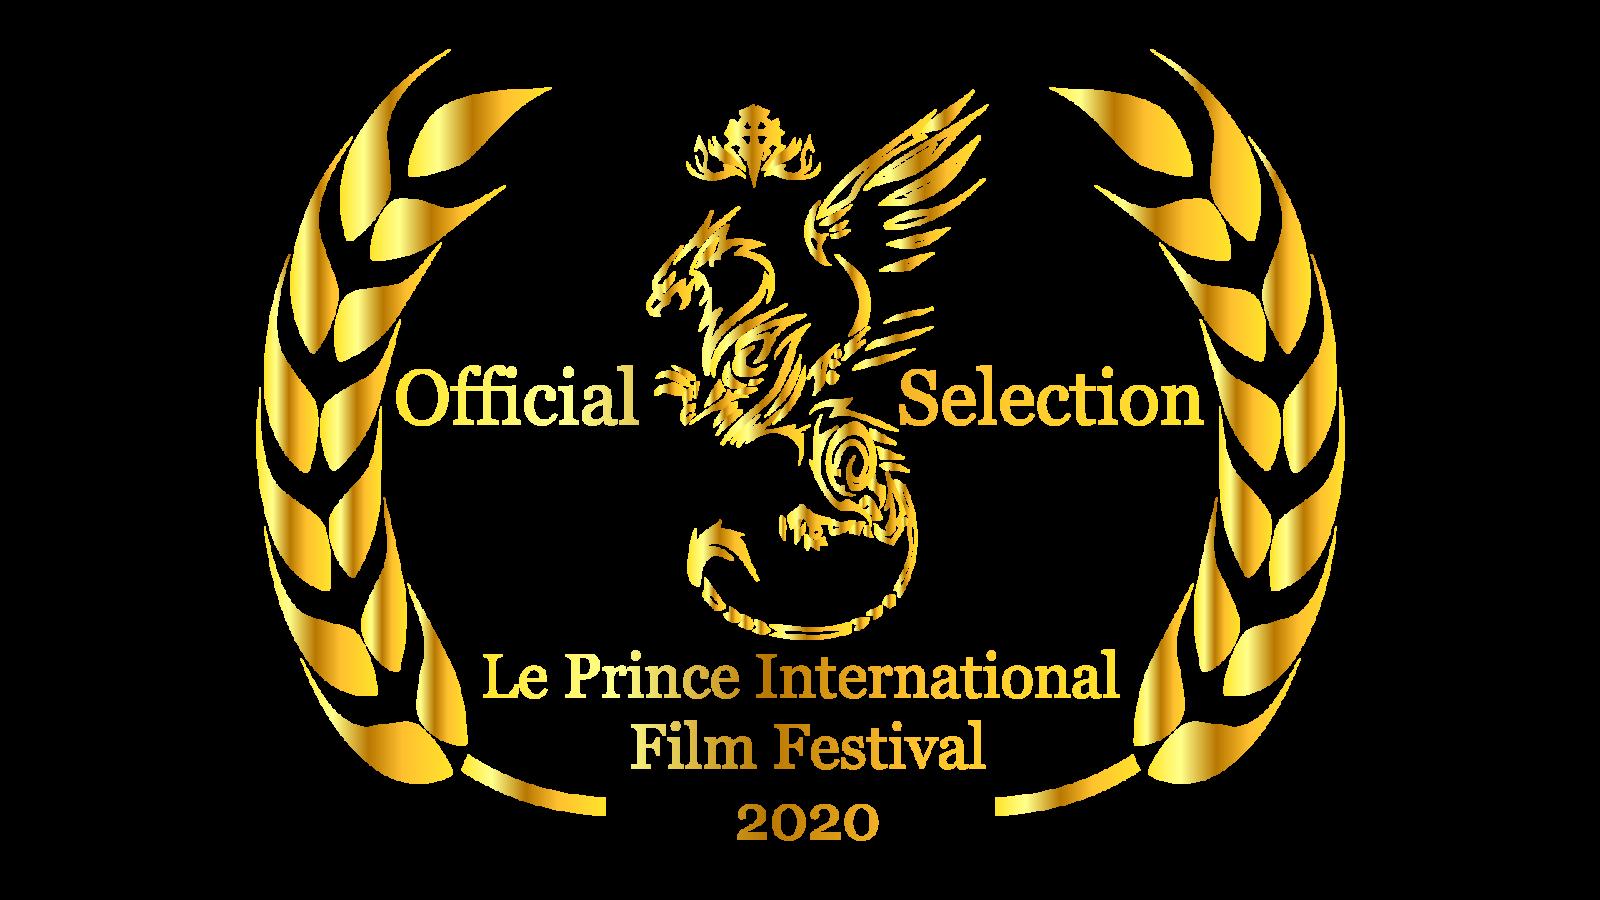 mejores cortometrajes 2020